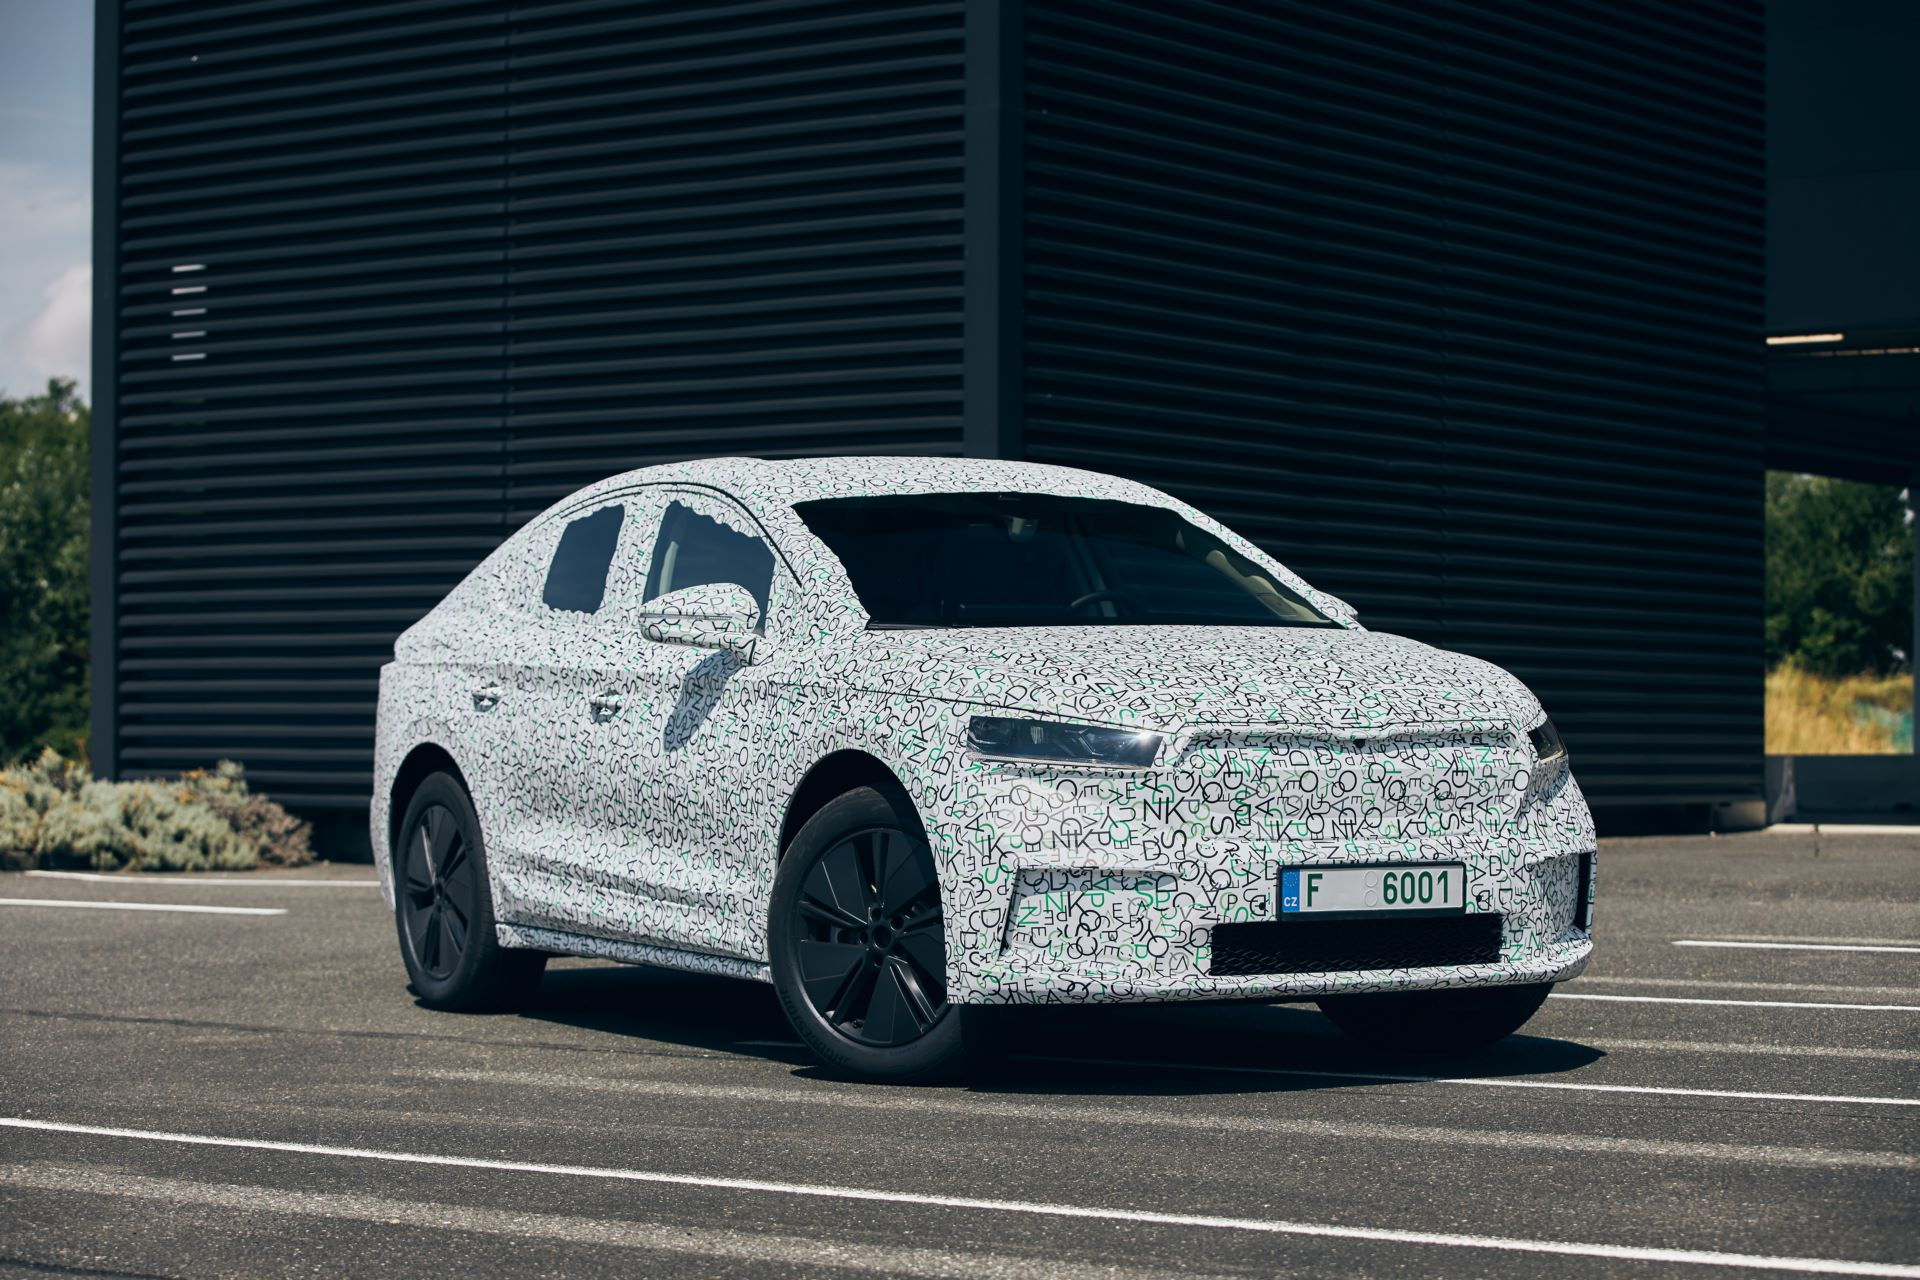 Skoda-Enyaq-Coupe-iV-specs-8